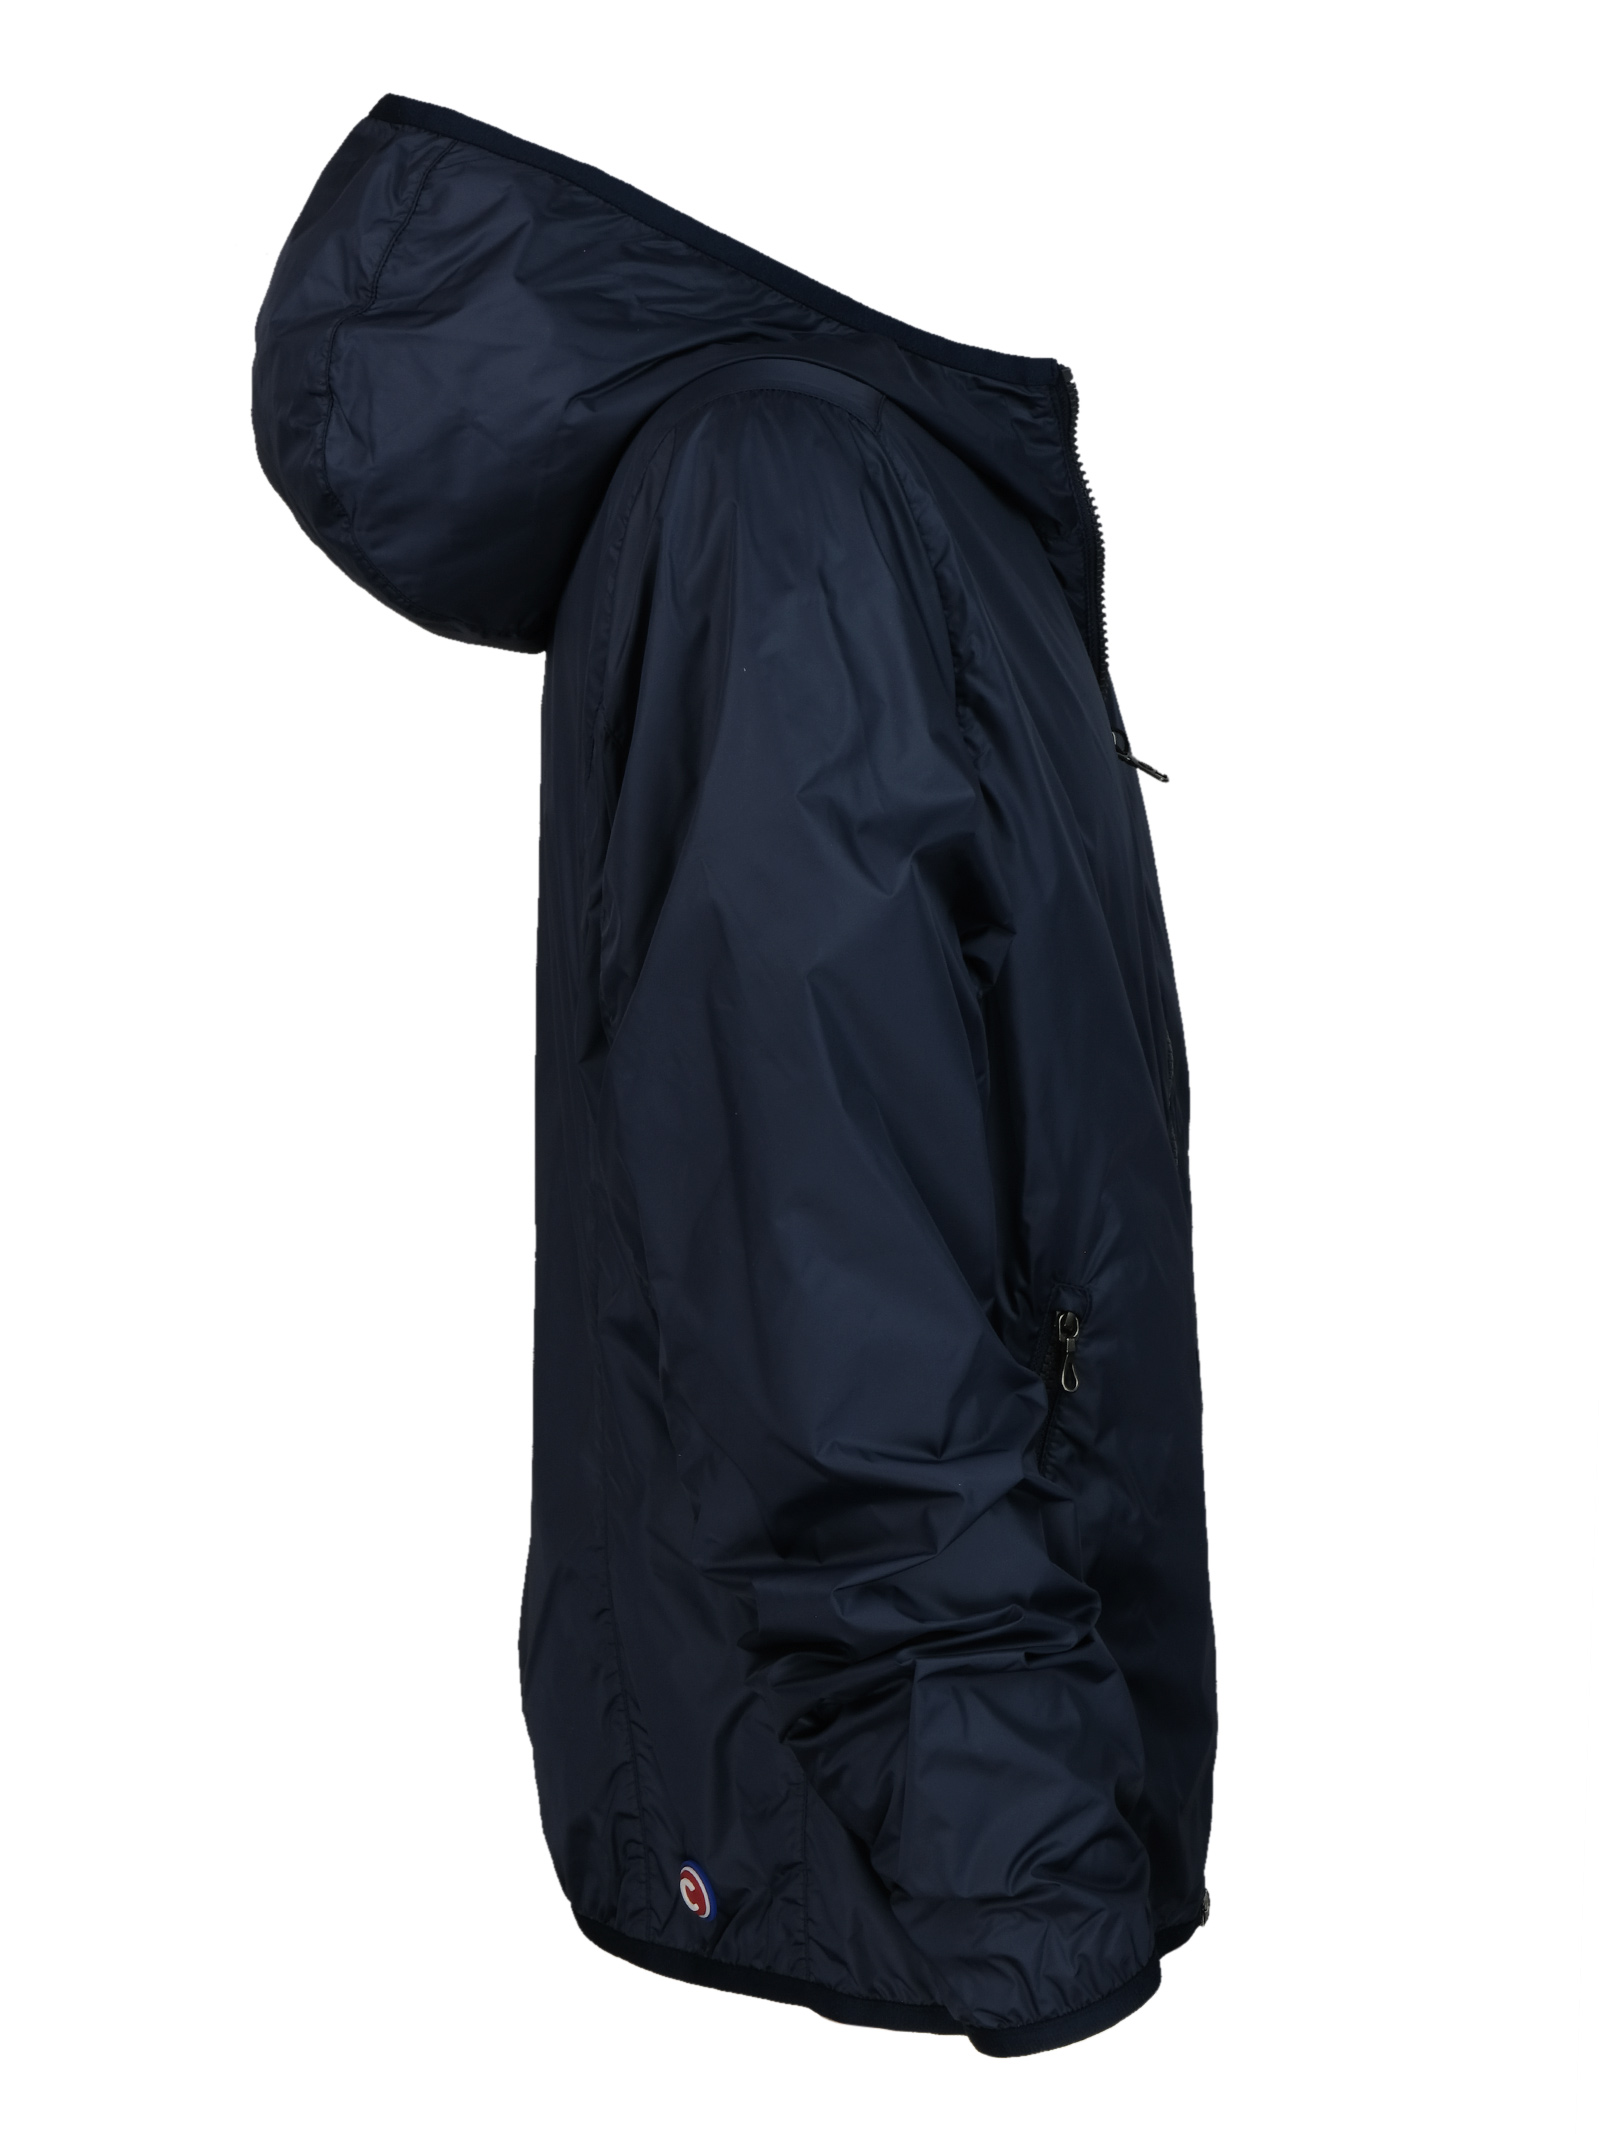 COLMAR | Jackets | 1842 5ST68A